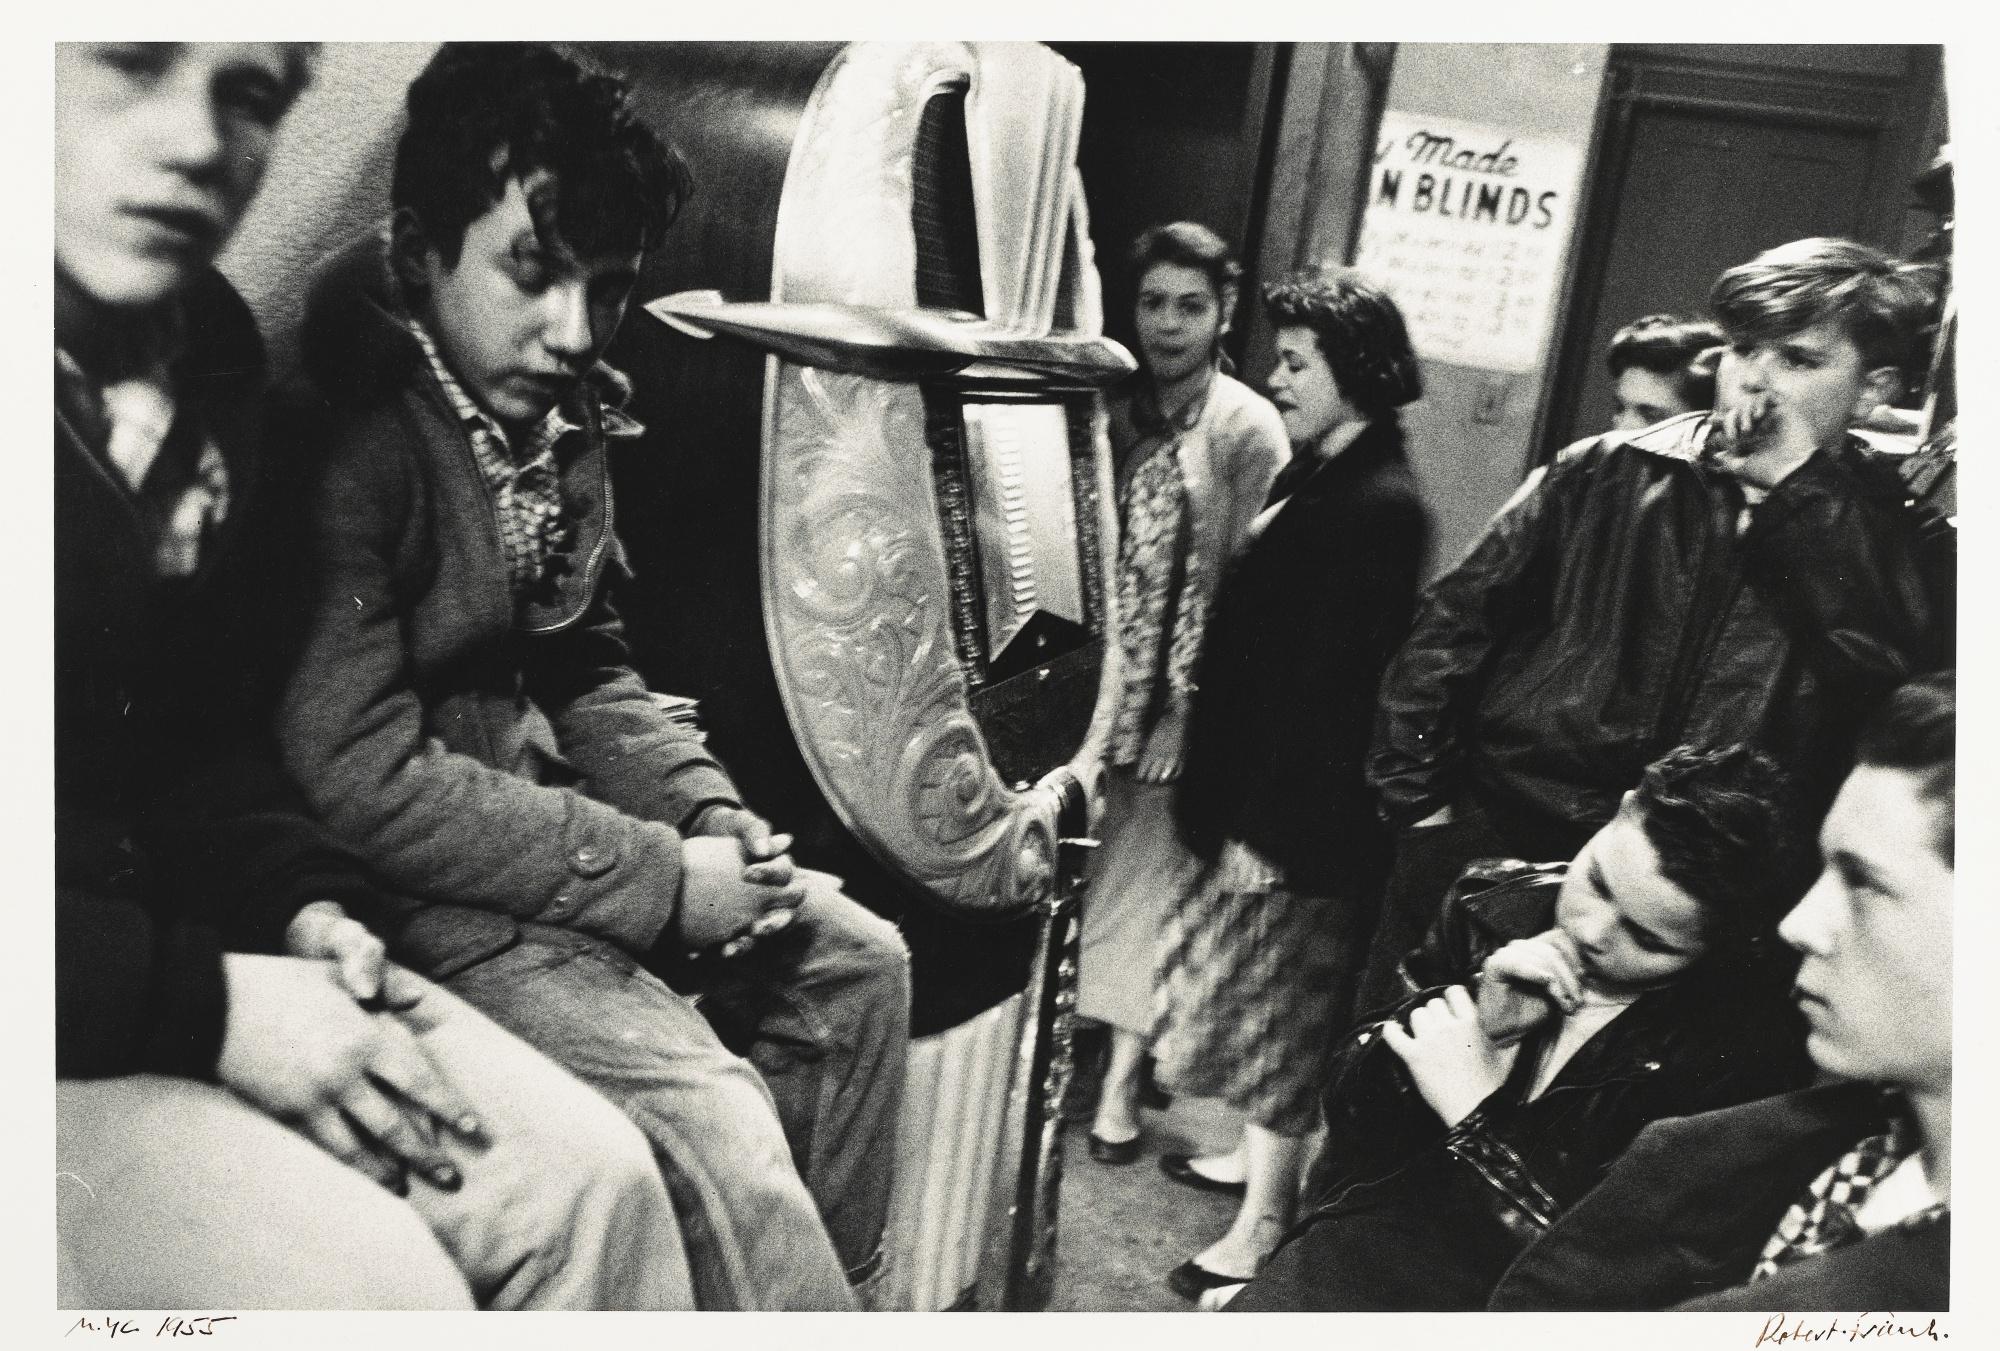 Robert Frank-Candy Store Upper West Side' New York-1955